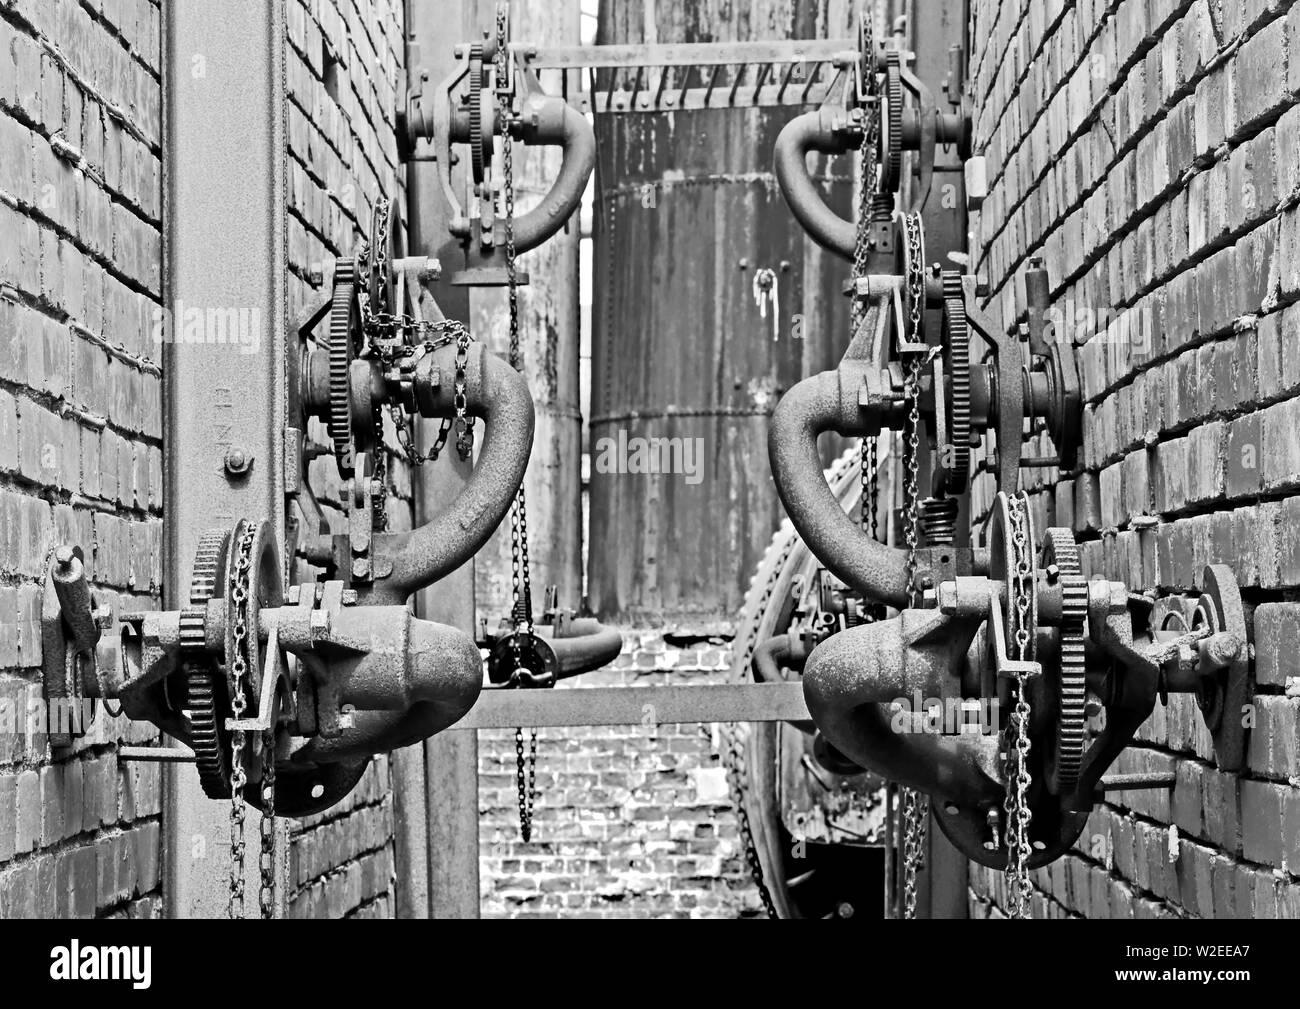 Industrial Relics #8 - Stock Image